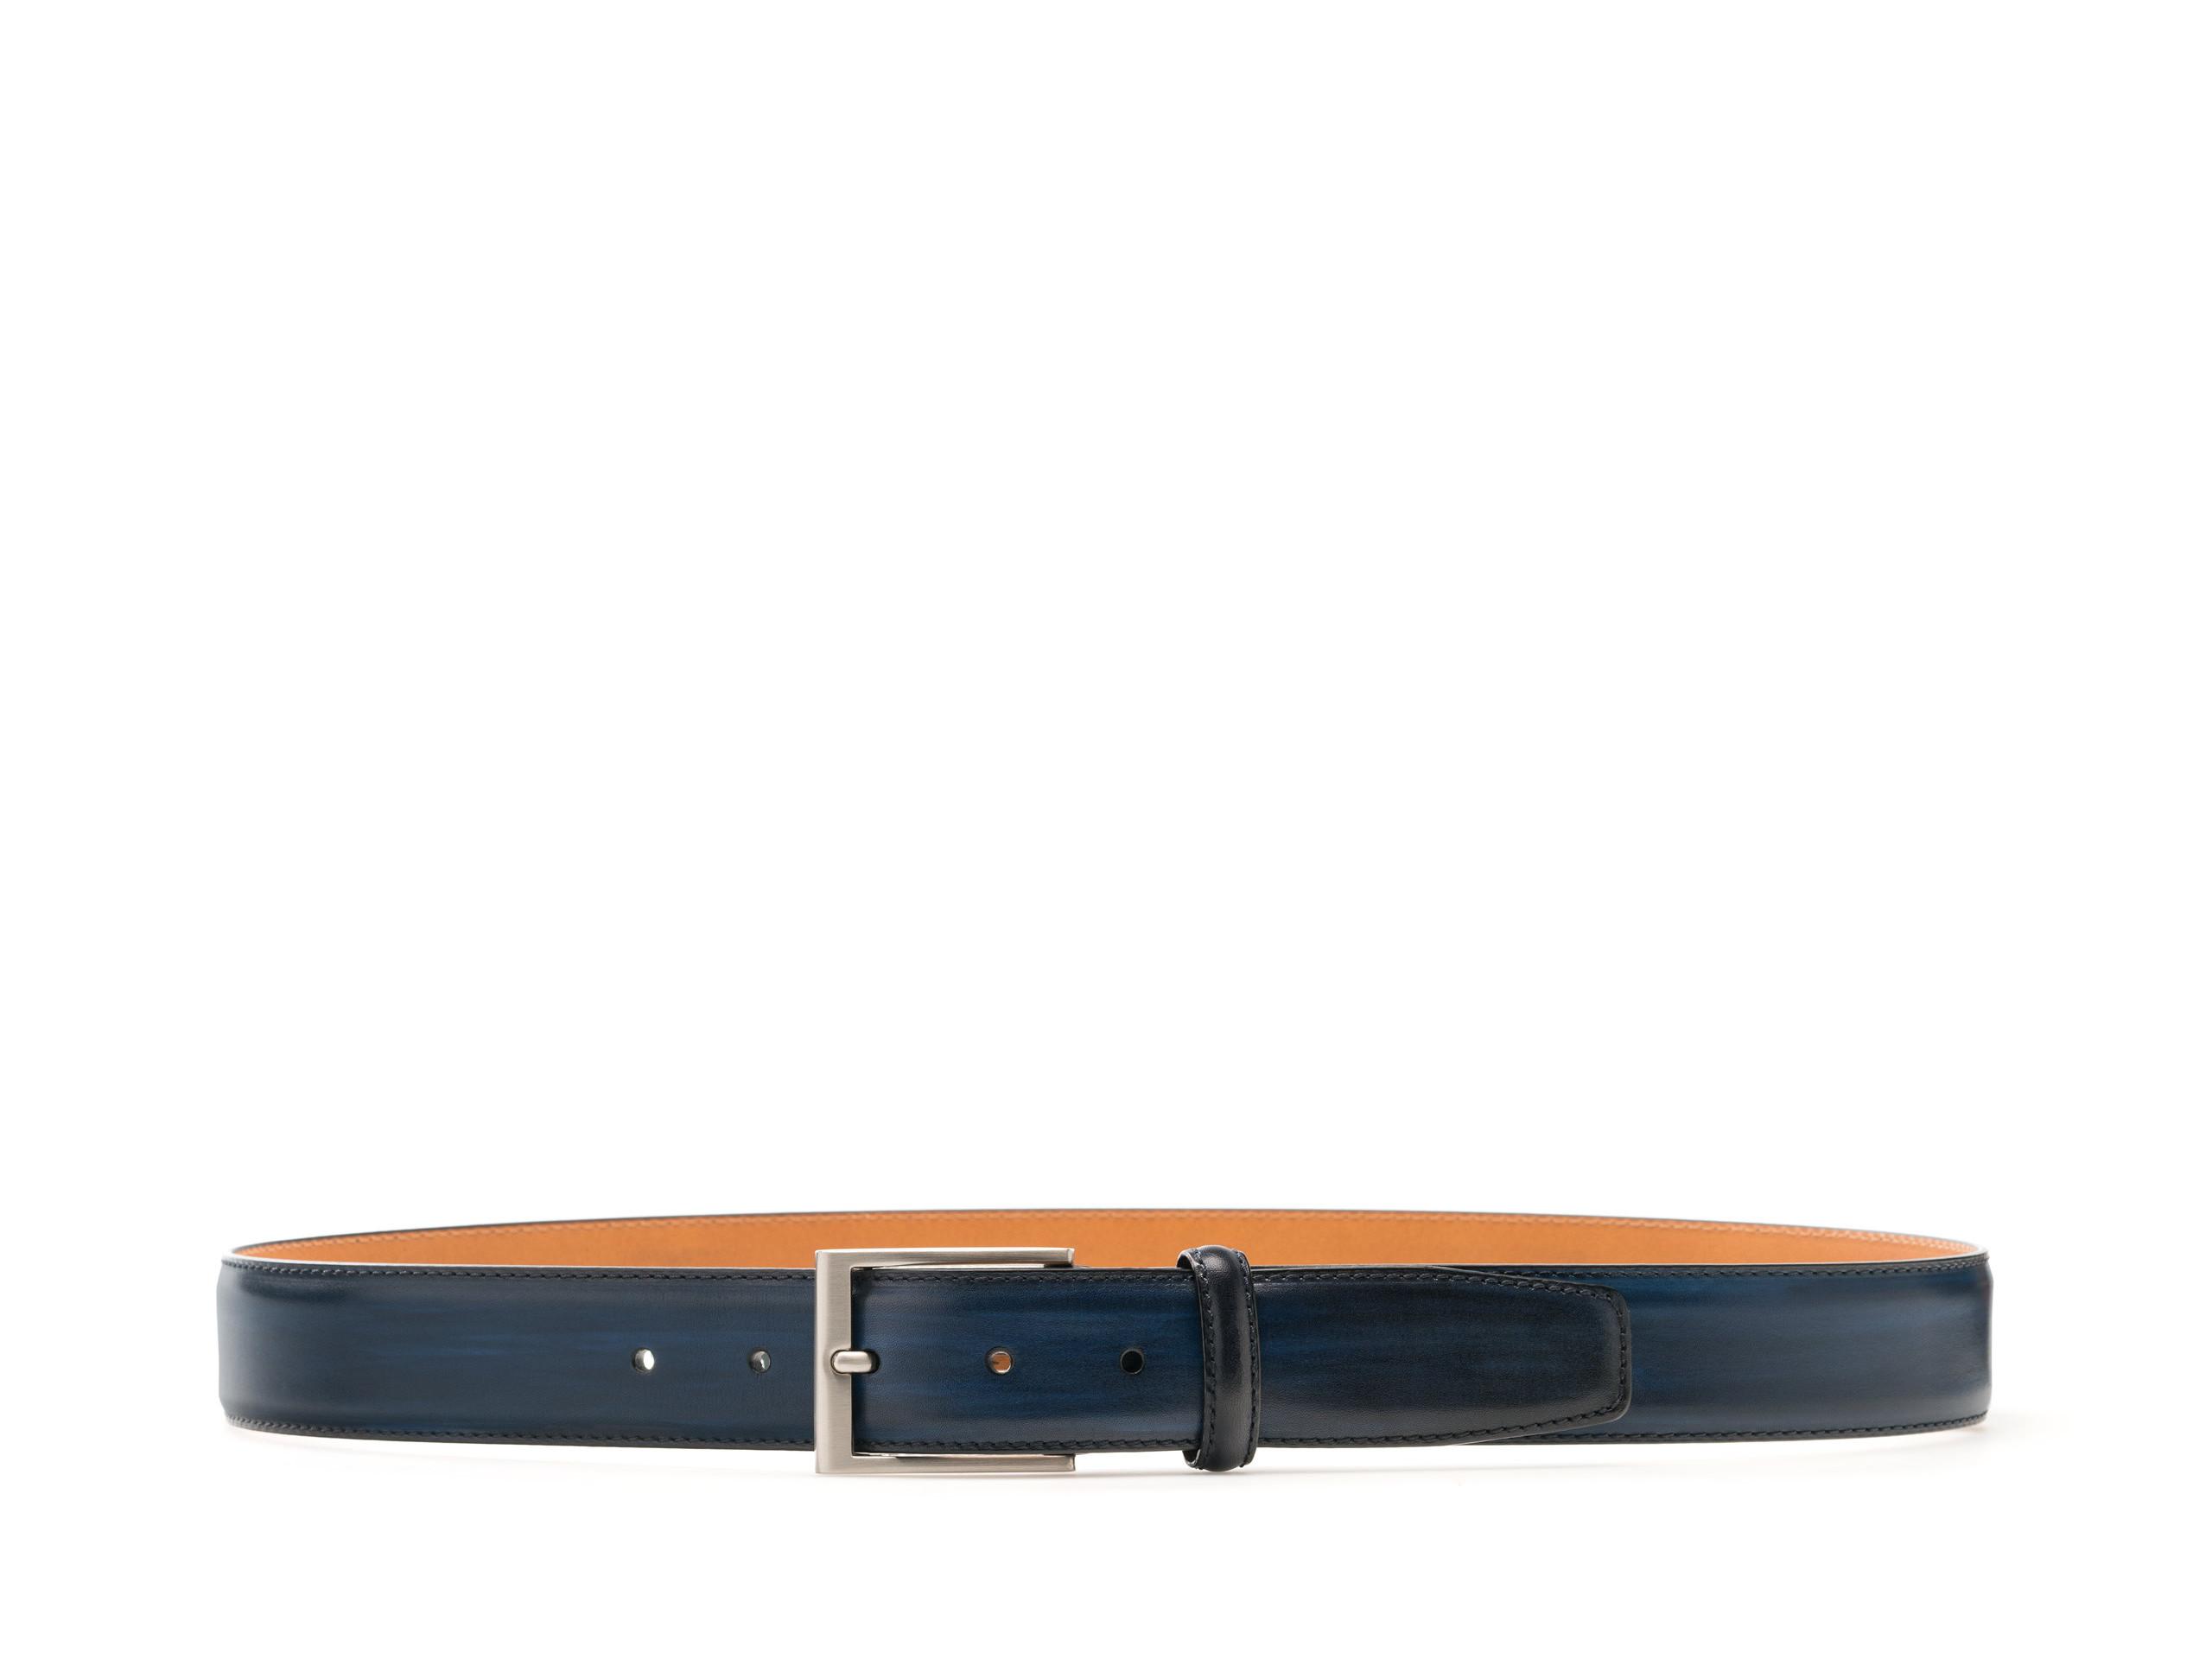 Product Shot of Arcade Navy Belt